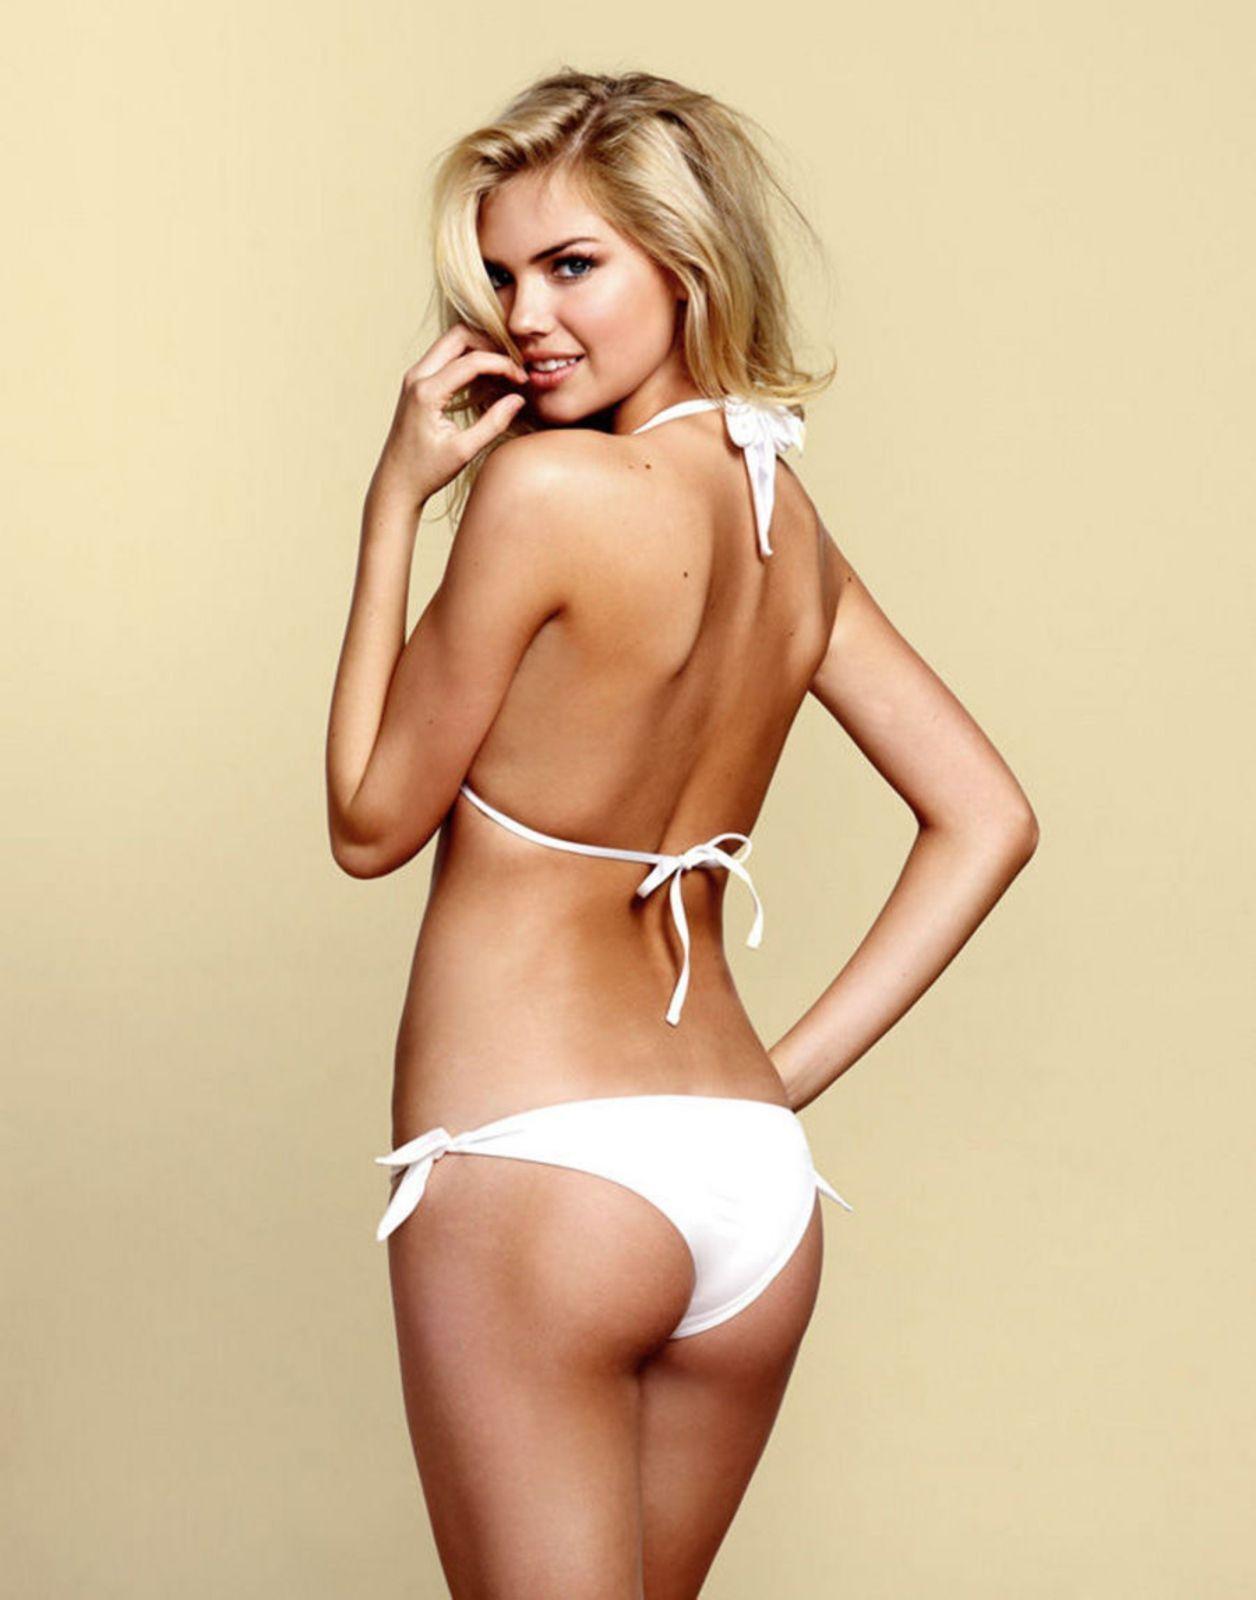 upton swimsuit wallpaper - photo #37